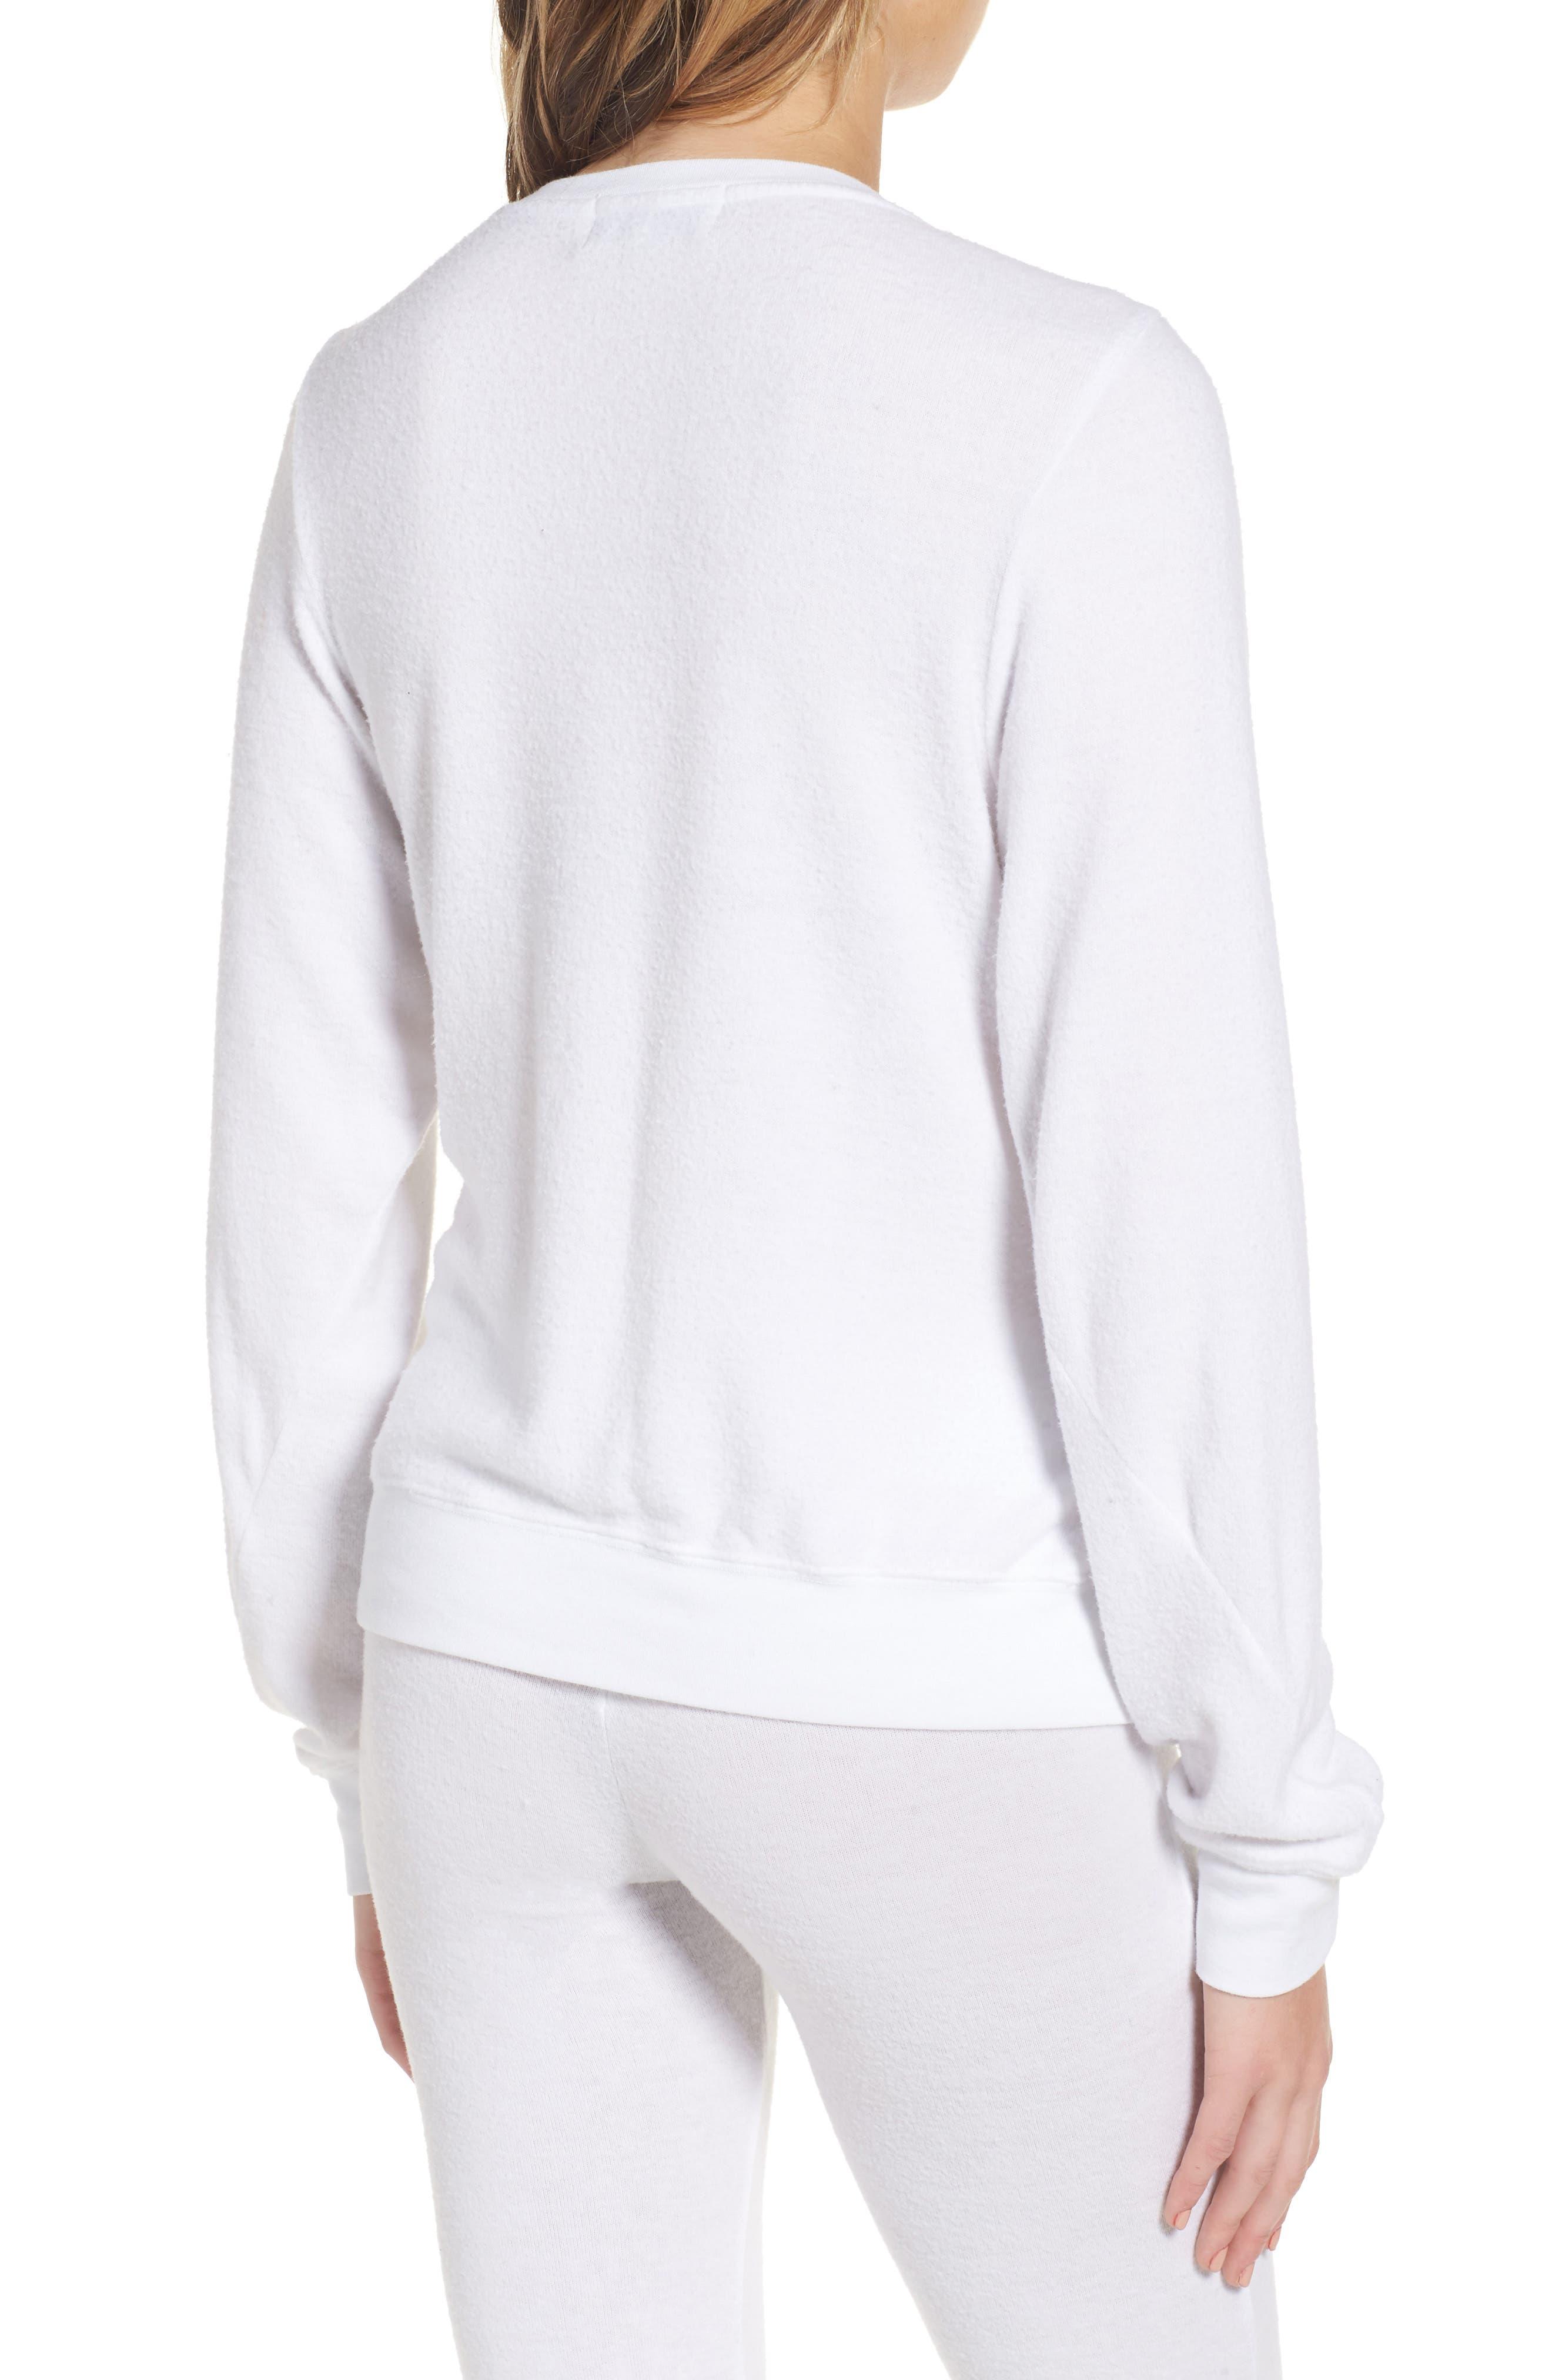 Peace Sweatshirt,                             Alternate thumbnail 2, color,                             White